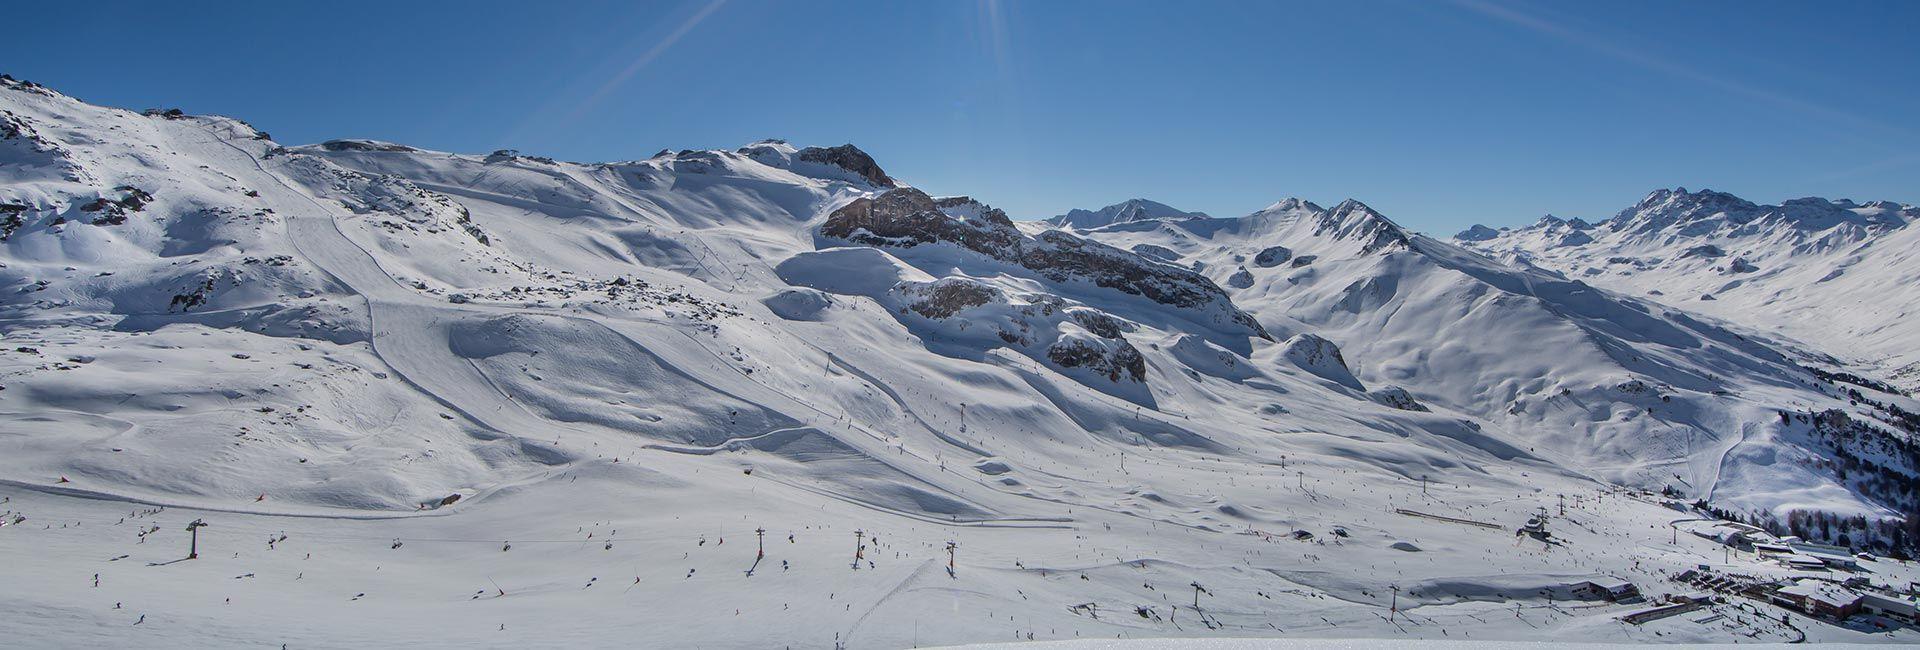 Winterurlaub in Samnaun